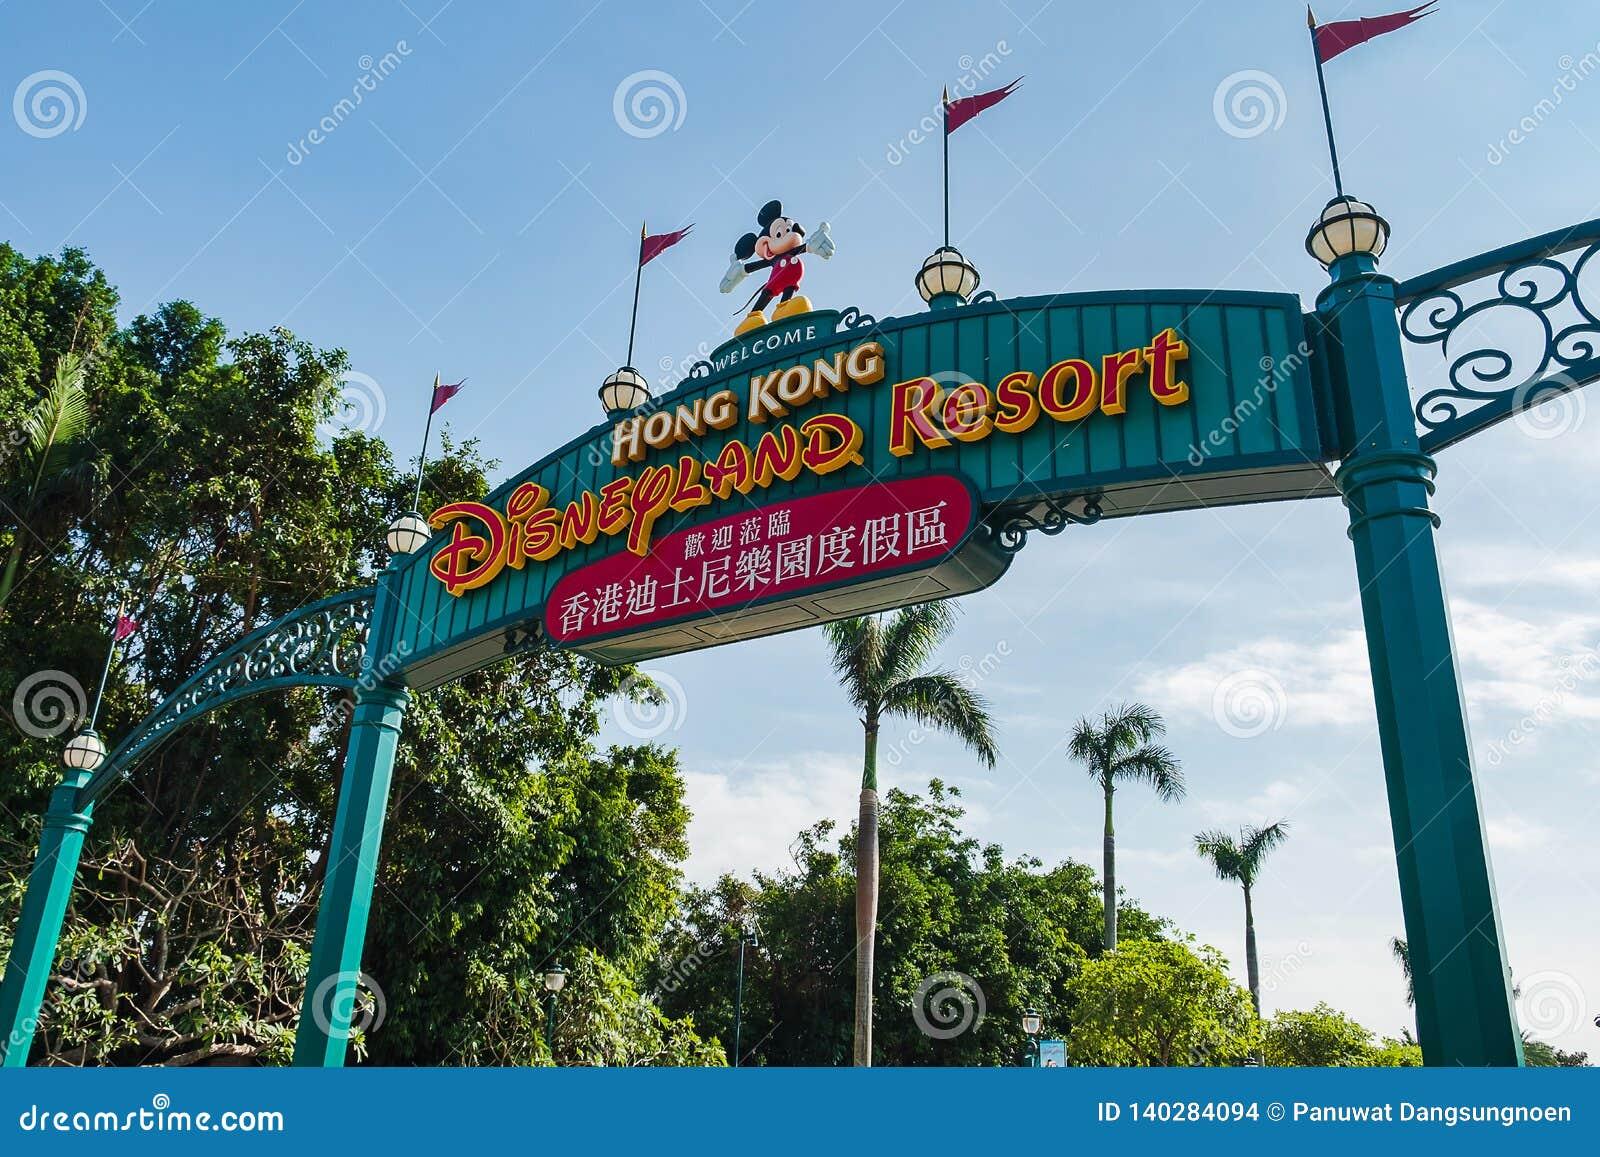 Entrance gate of Hong Kong Disneyland resort, landmark and popular for tourist attraction; Hong Kong, China,17 December 2018